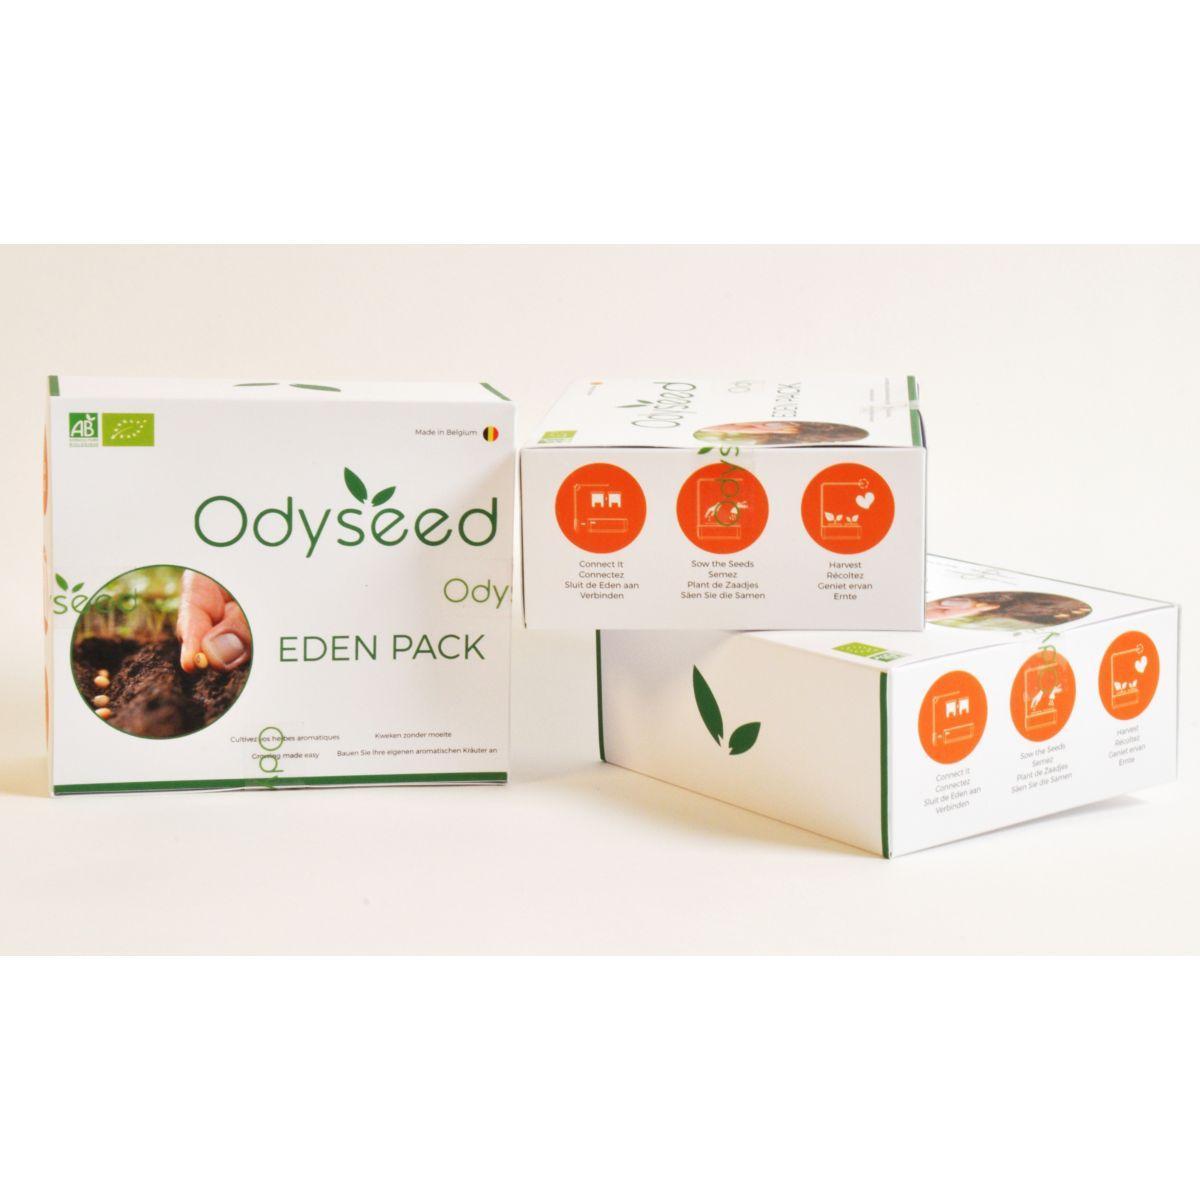 Recharge odyseed persil & basilic thai - 10% de remise imm�diate avec le code : paques10 (photo)